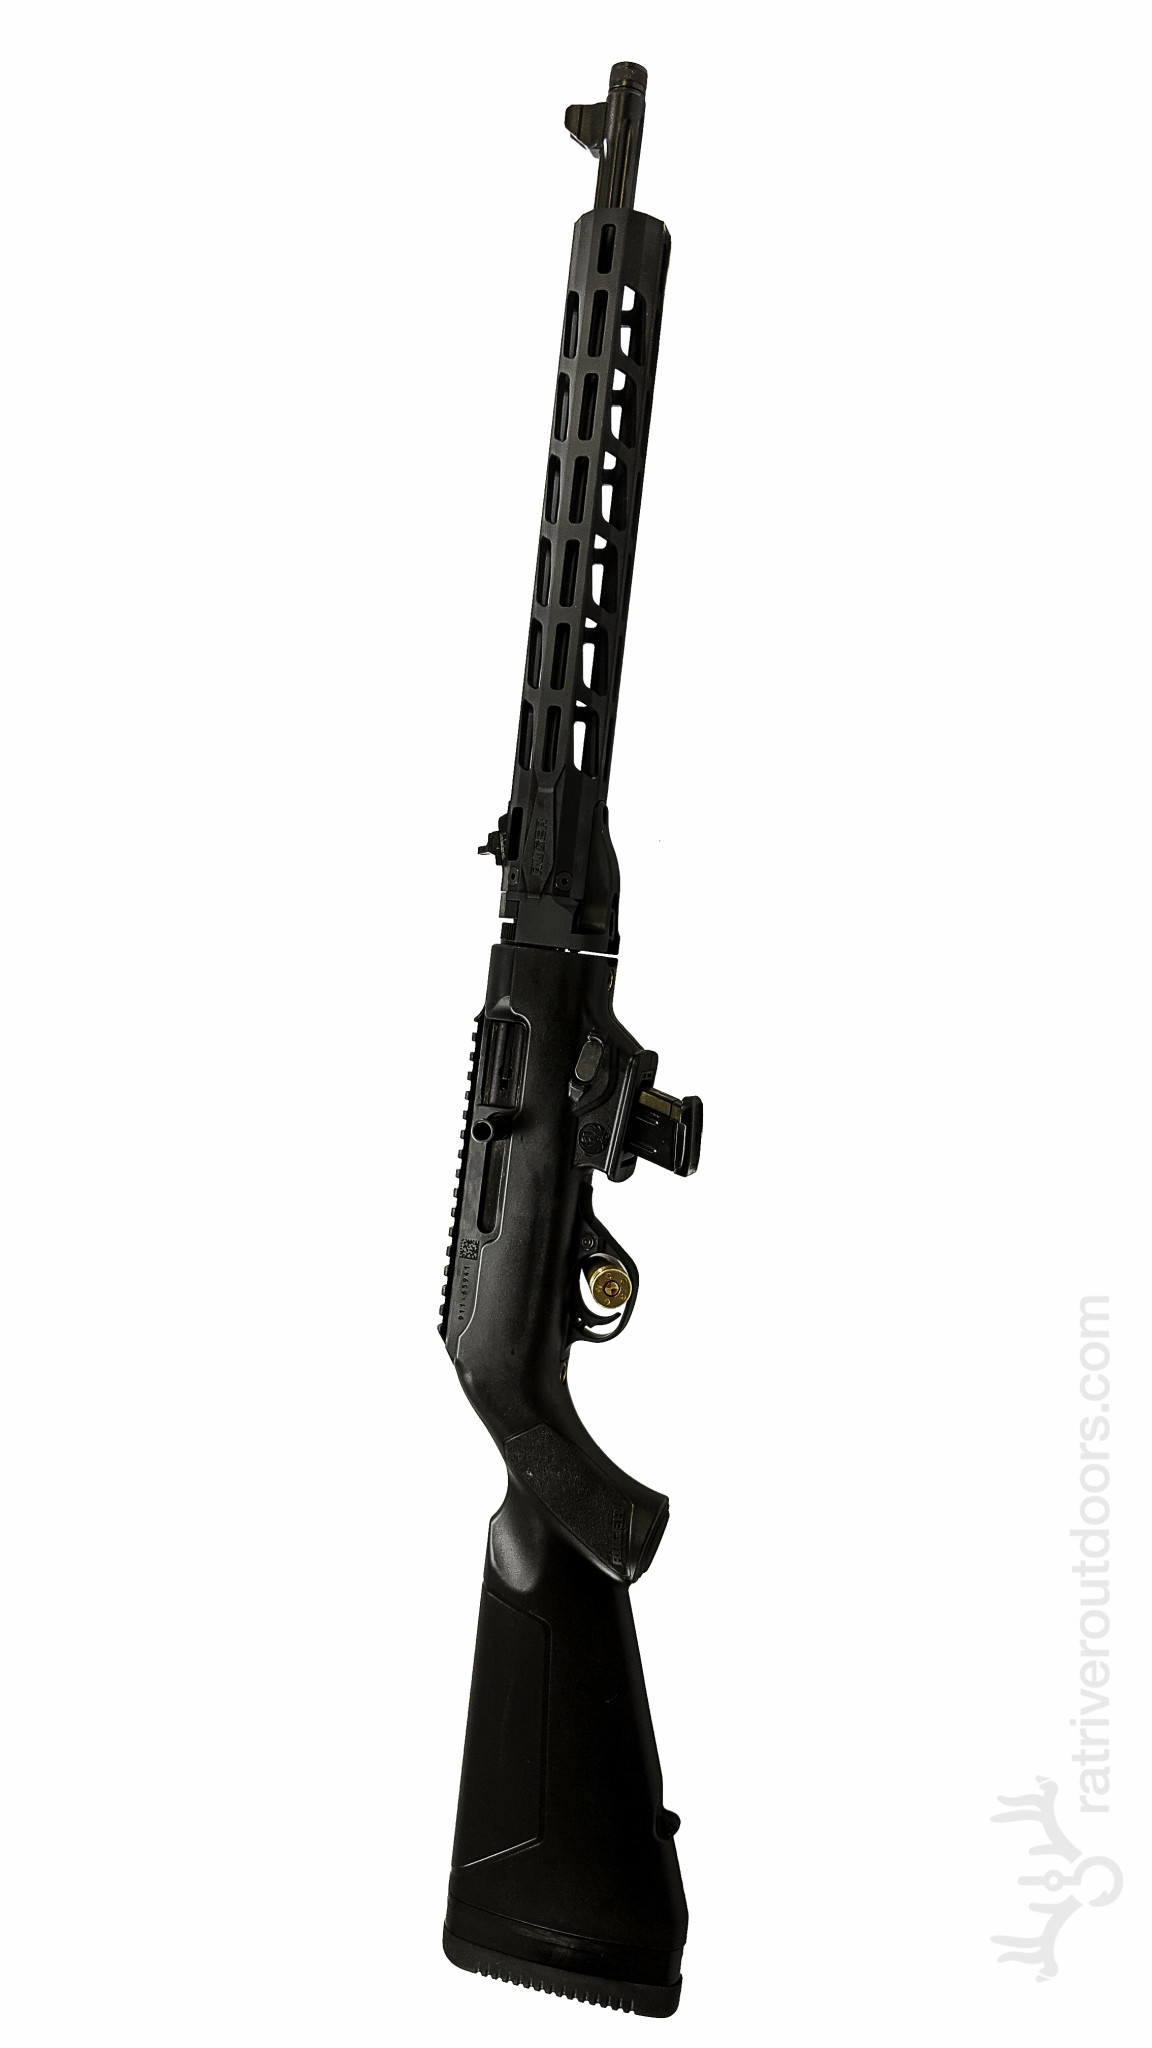 Ruger PC Carbine 9mm Luger Free-Float Handguard